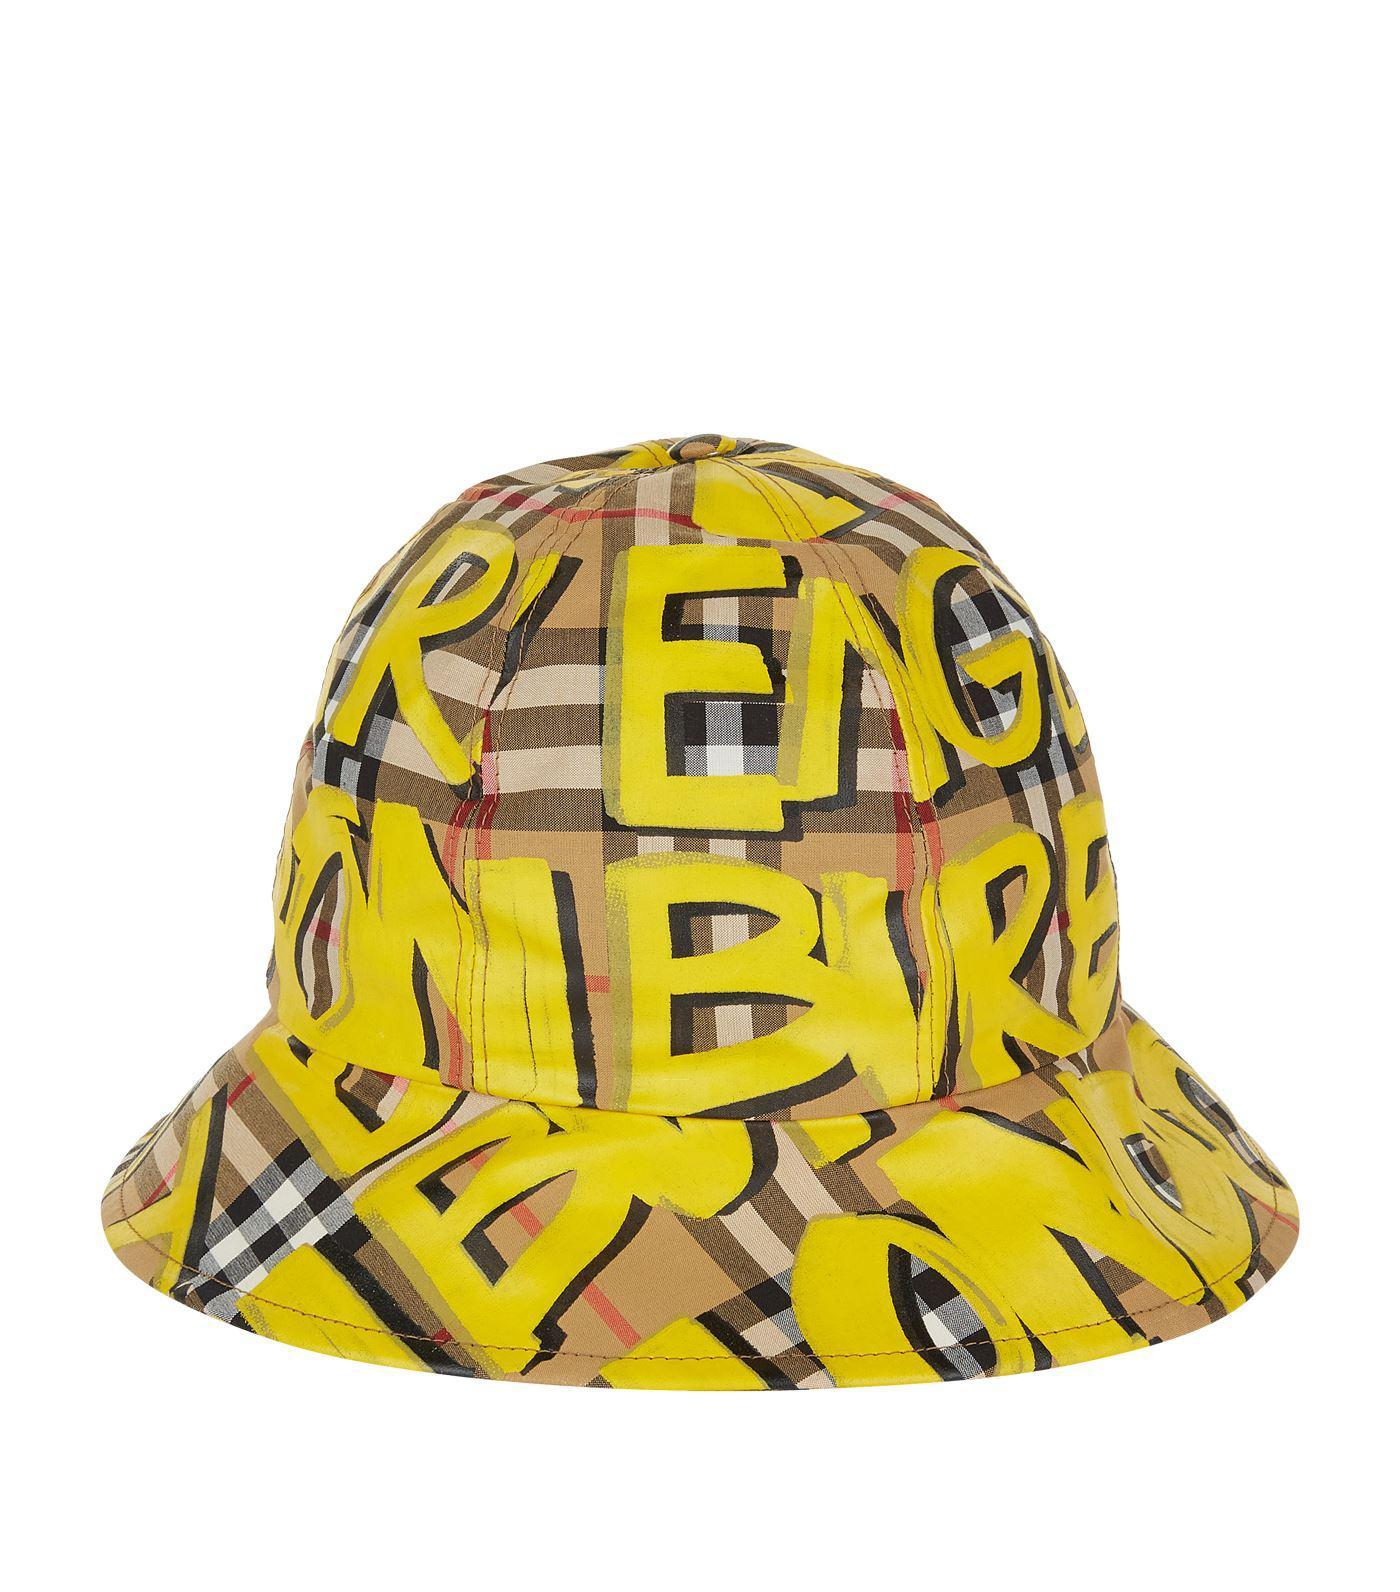 ddd3e532632 Lyst - Burberry Graffiti Check Bucket Hat in Yellow